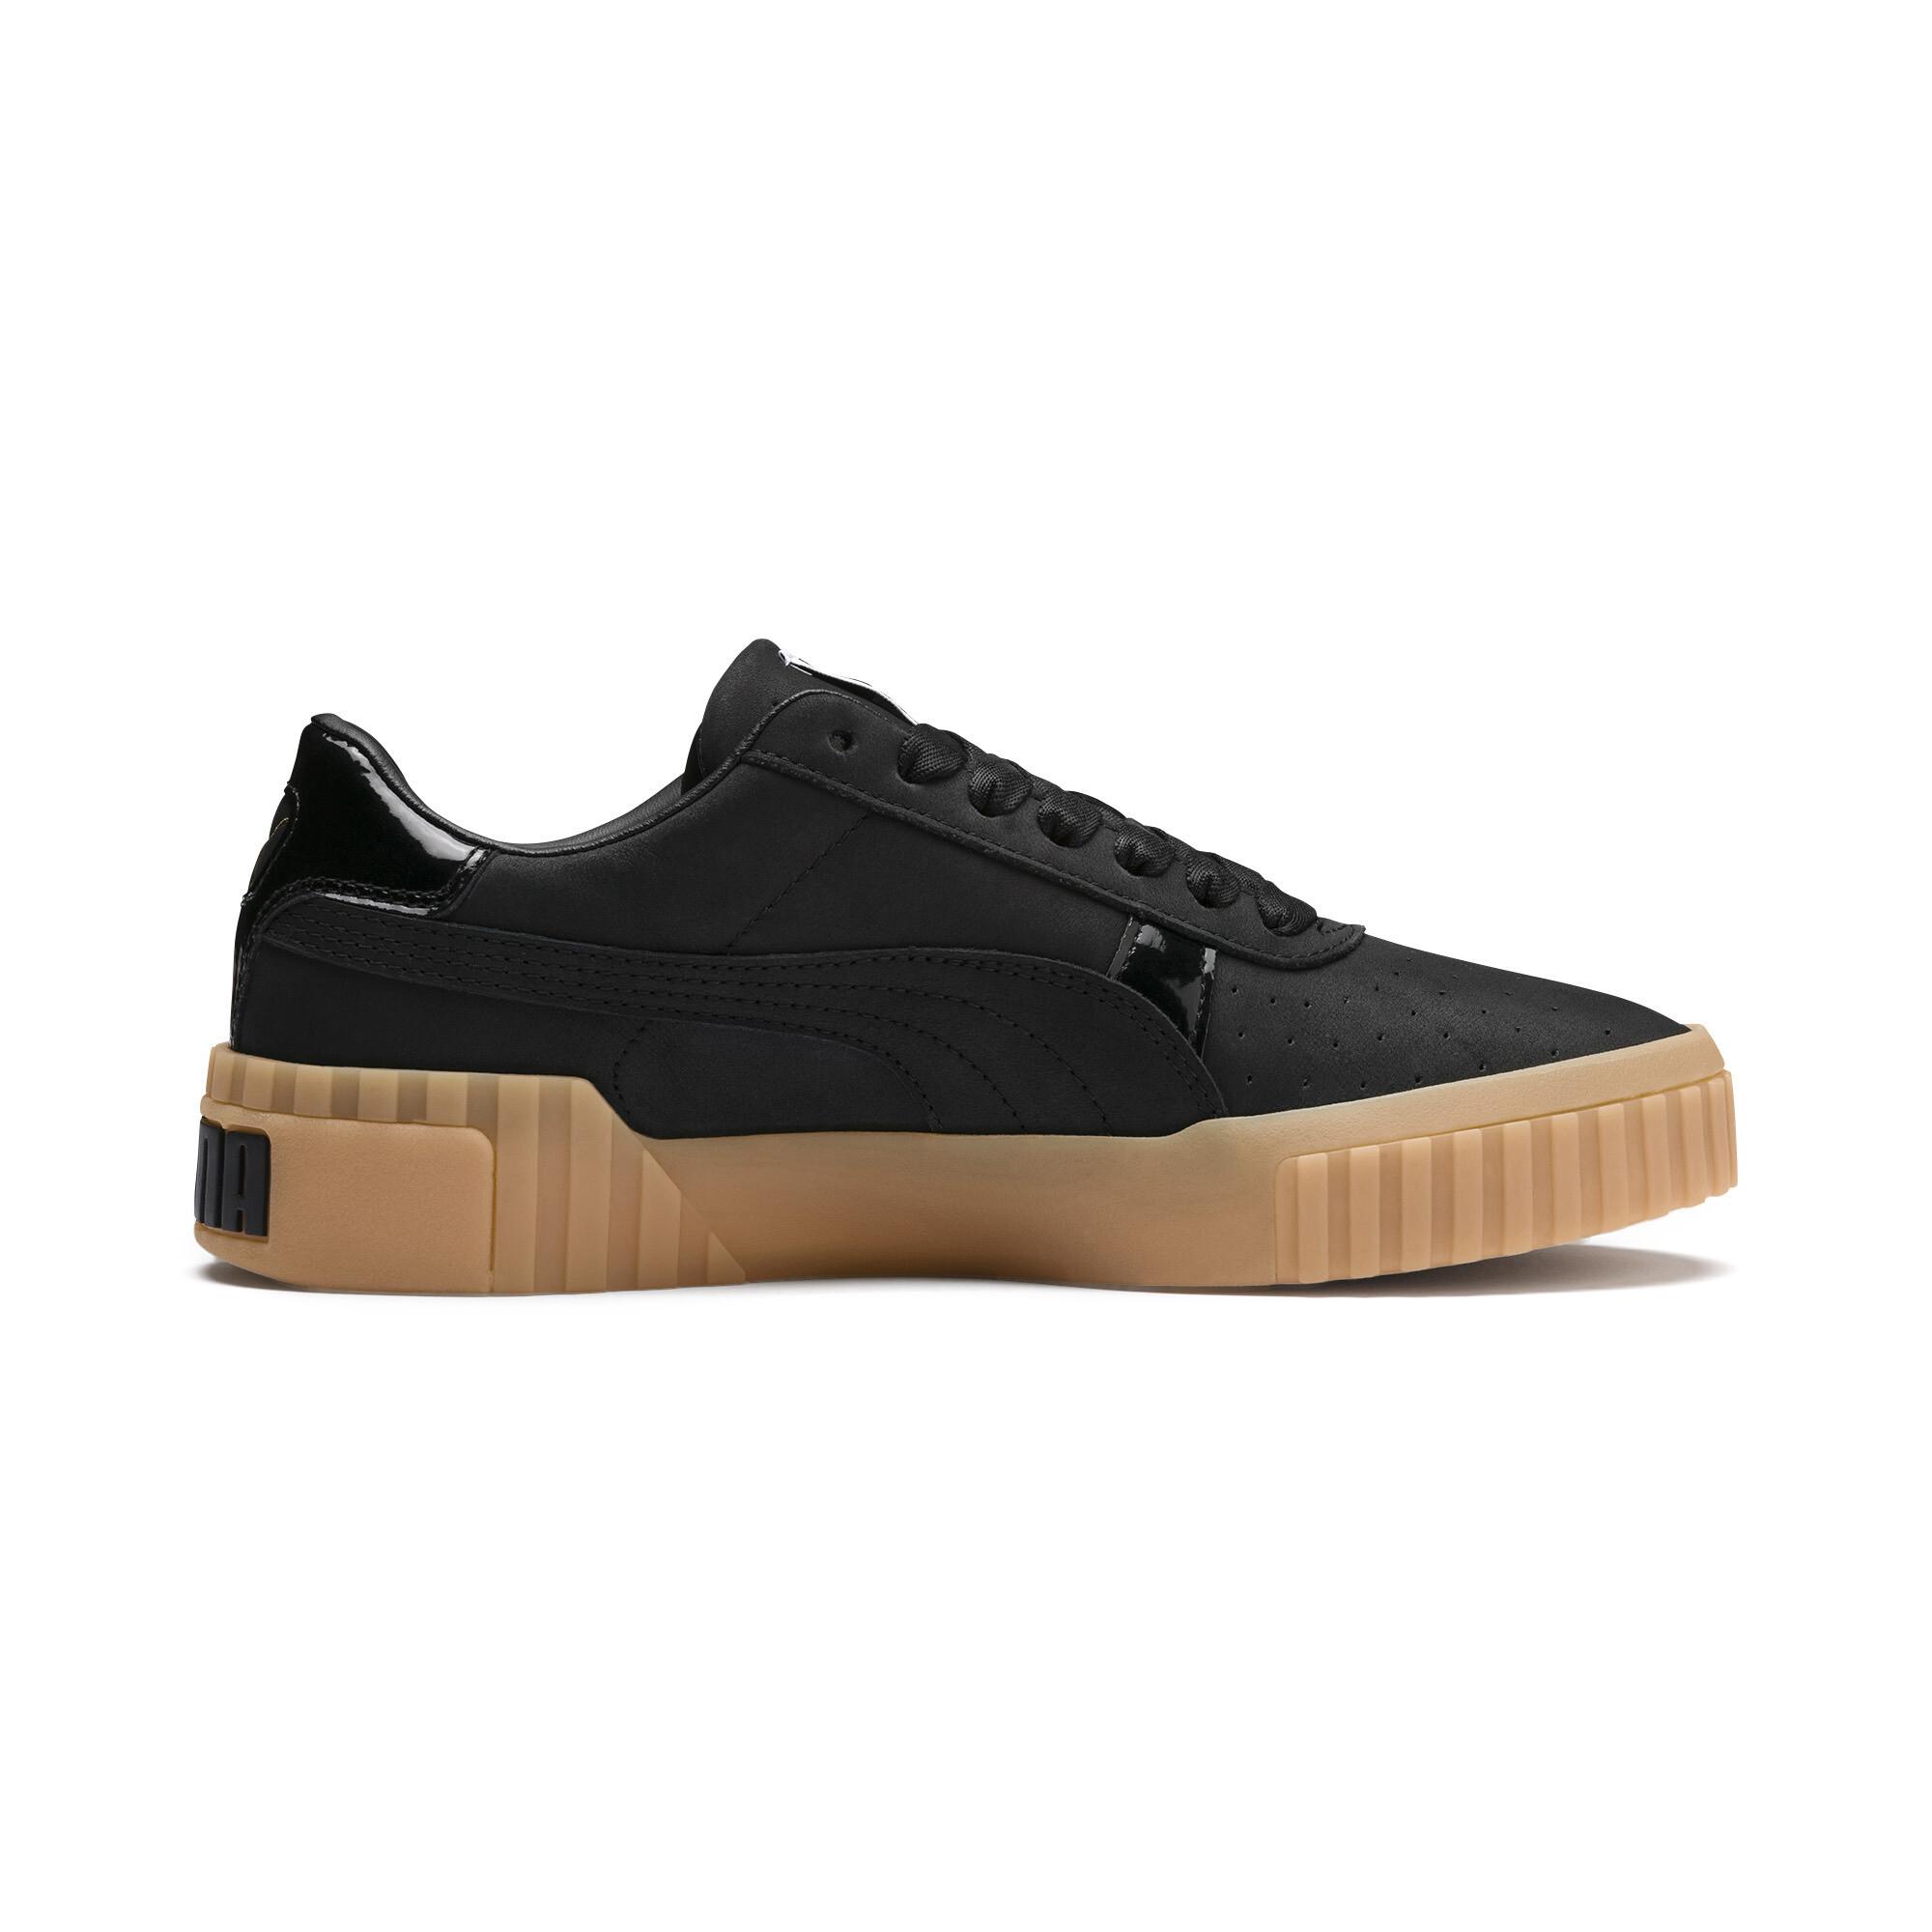 Image Puma Cali Nubuck Women's Sneakers #6